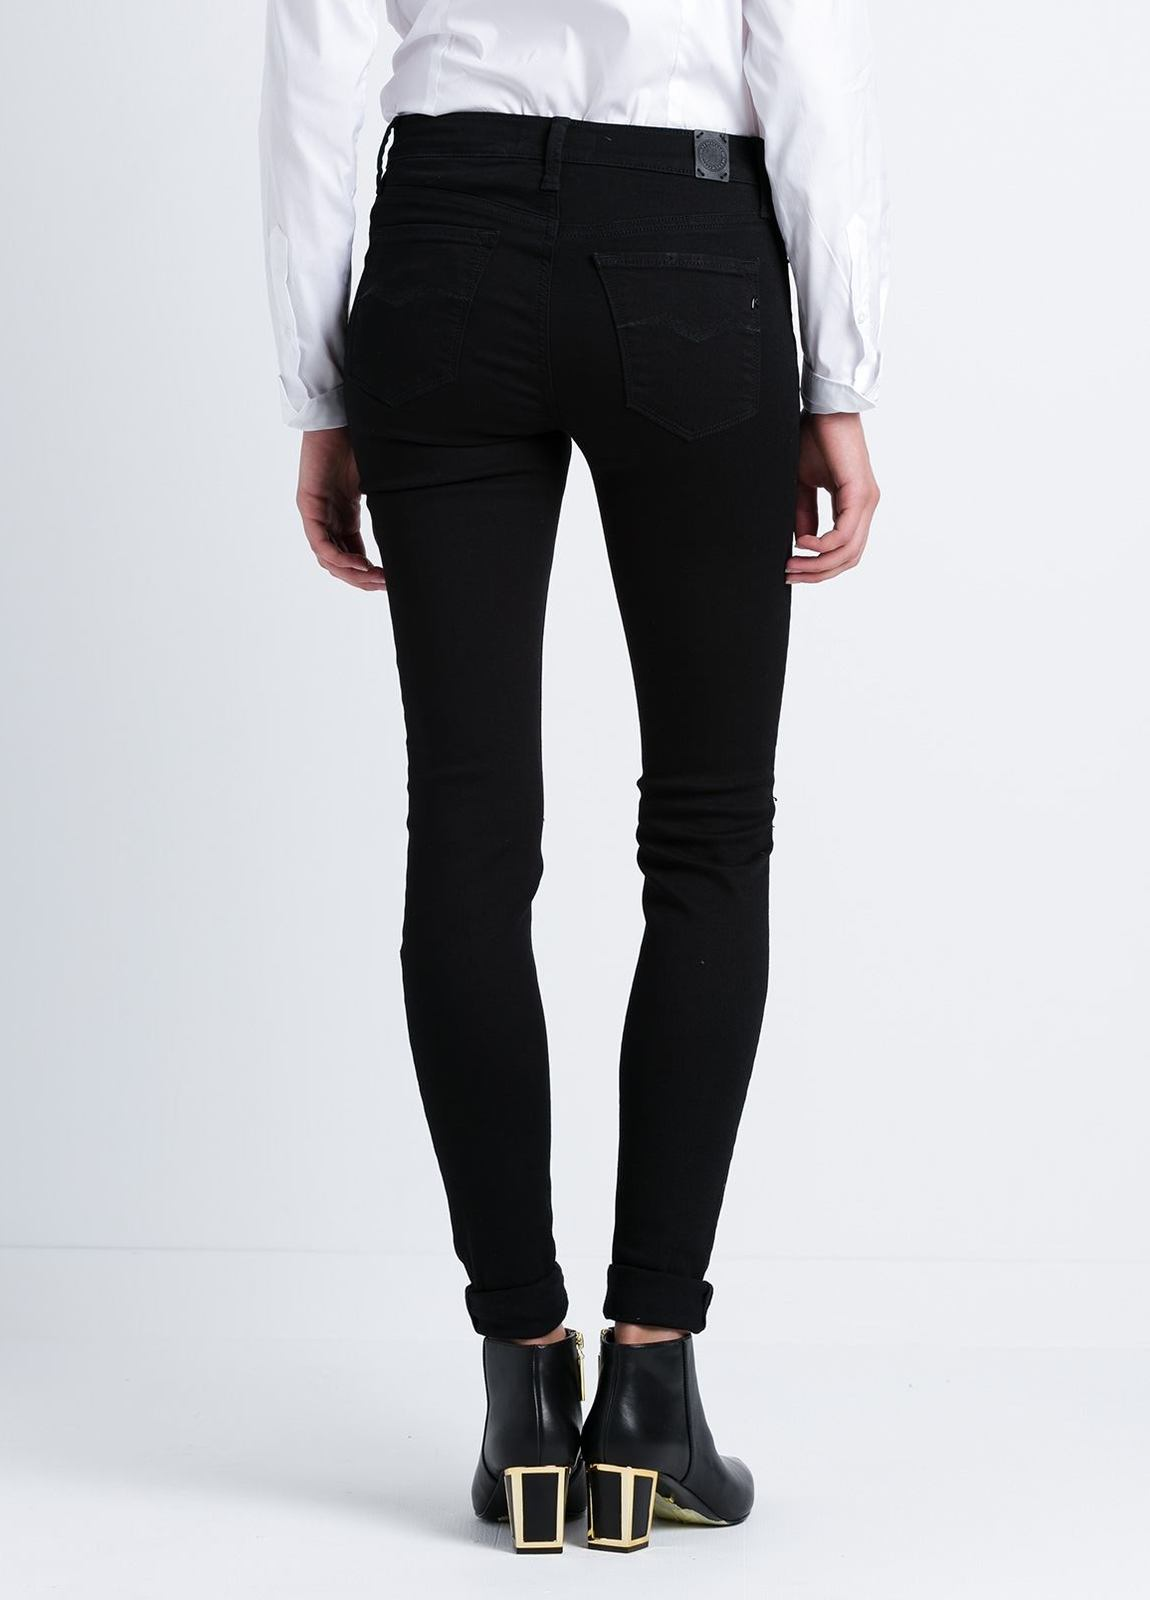 Tejano jegging modelo JOI con roturas en las rodillas color negro lavado denim. Algodón, Modal, Elastano. - Ítem3